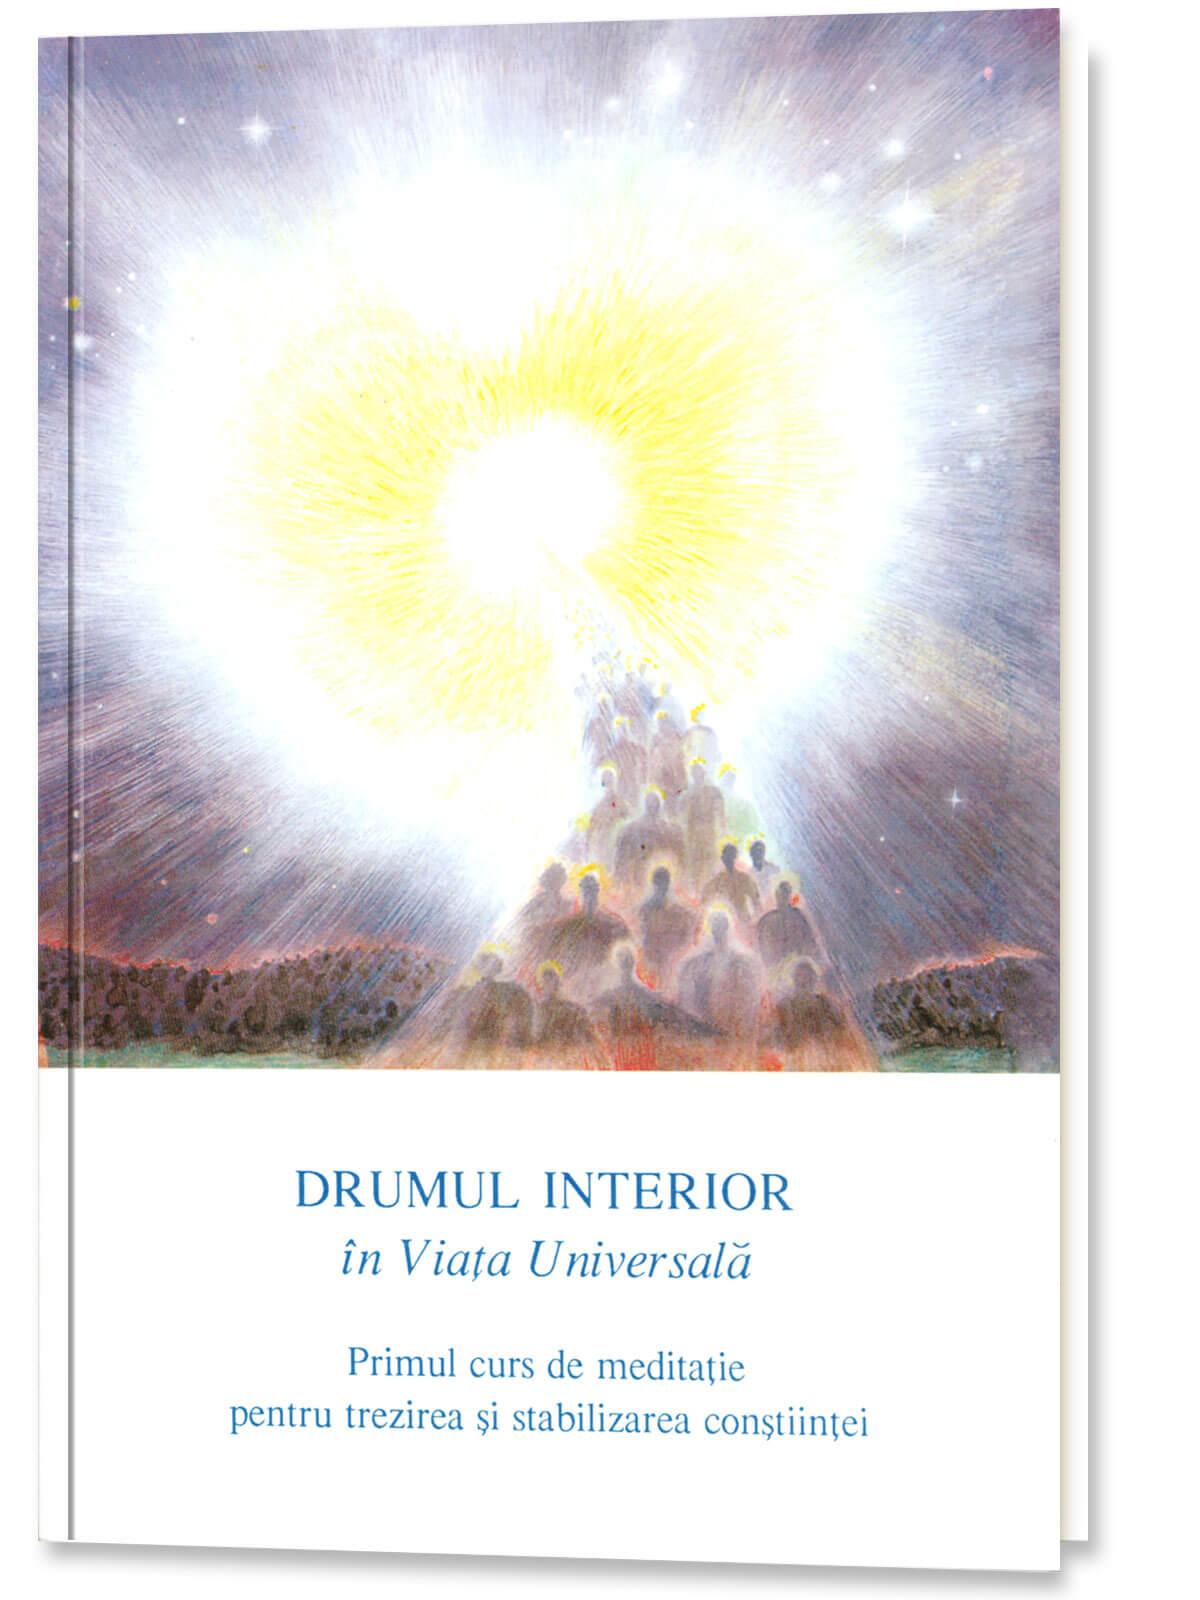 Drumul Interior in Viata Universala